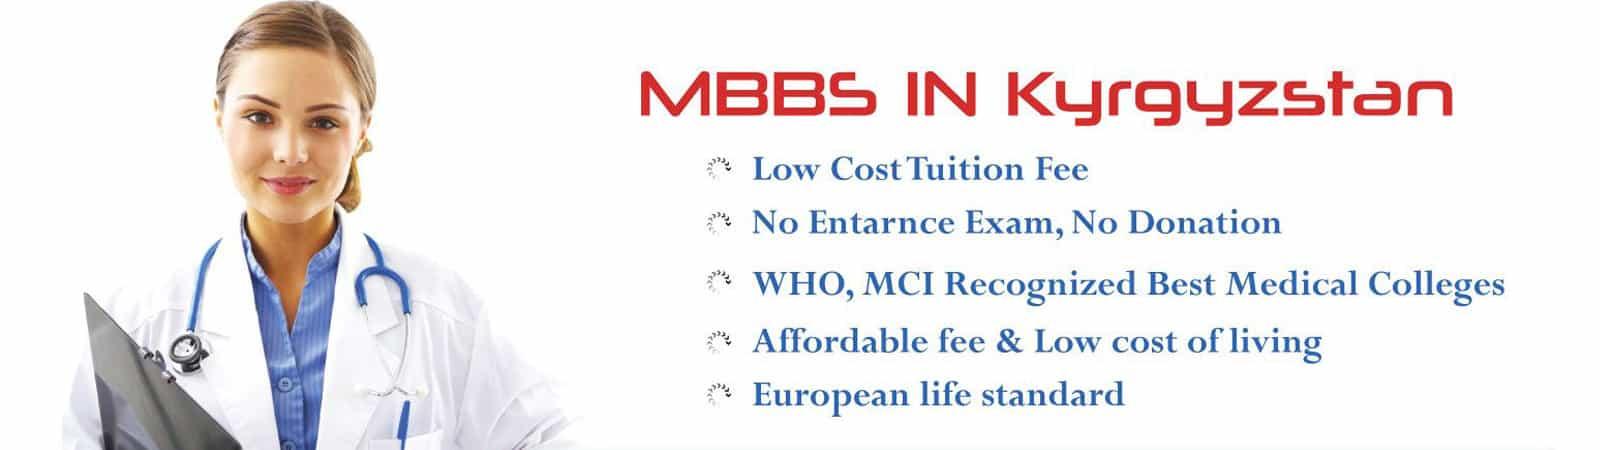 Study mbbs in Kyrgyzstan, kyrgyzstan medical college